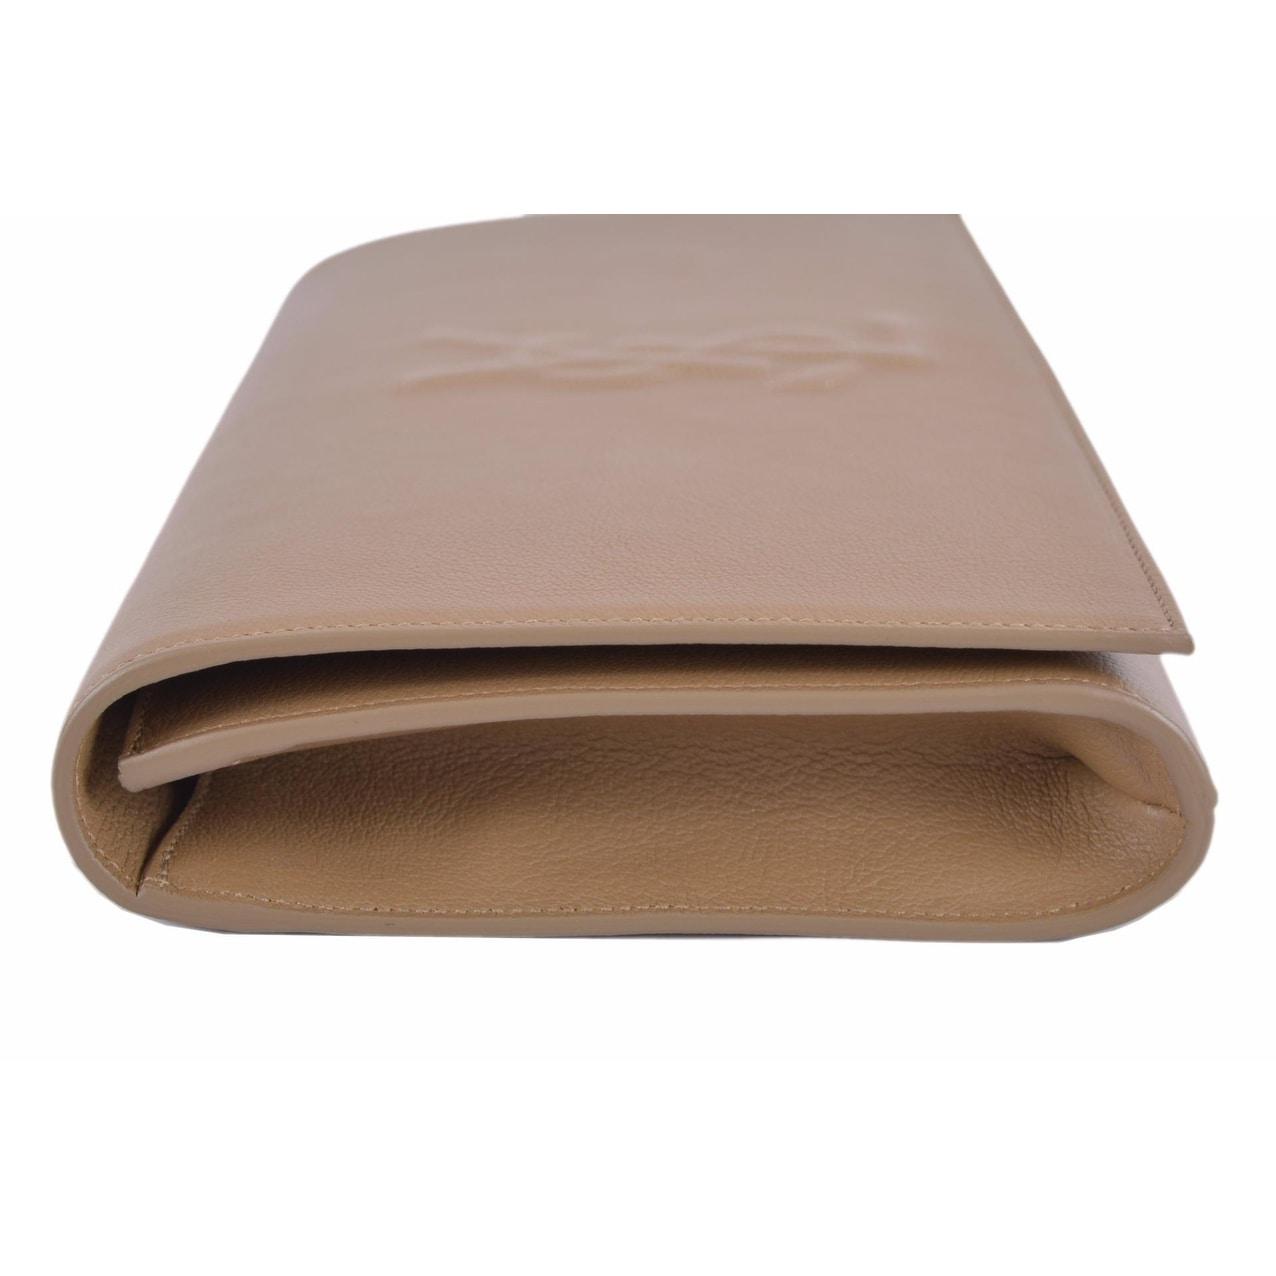 4a711b89980 Shop Saint Laurent YSL 361120 Beige Leather Large Belle de Jour Clutch  Handbag - On Sale - Ships To Canada - Overstock - 12057528